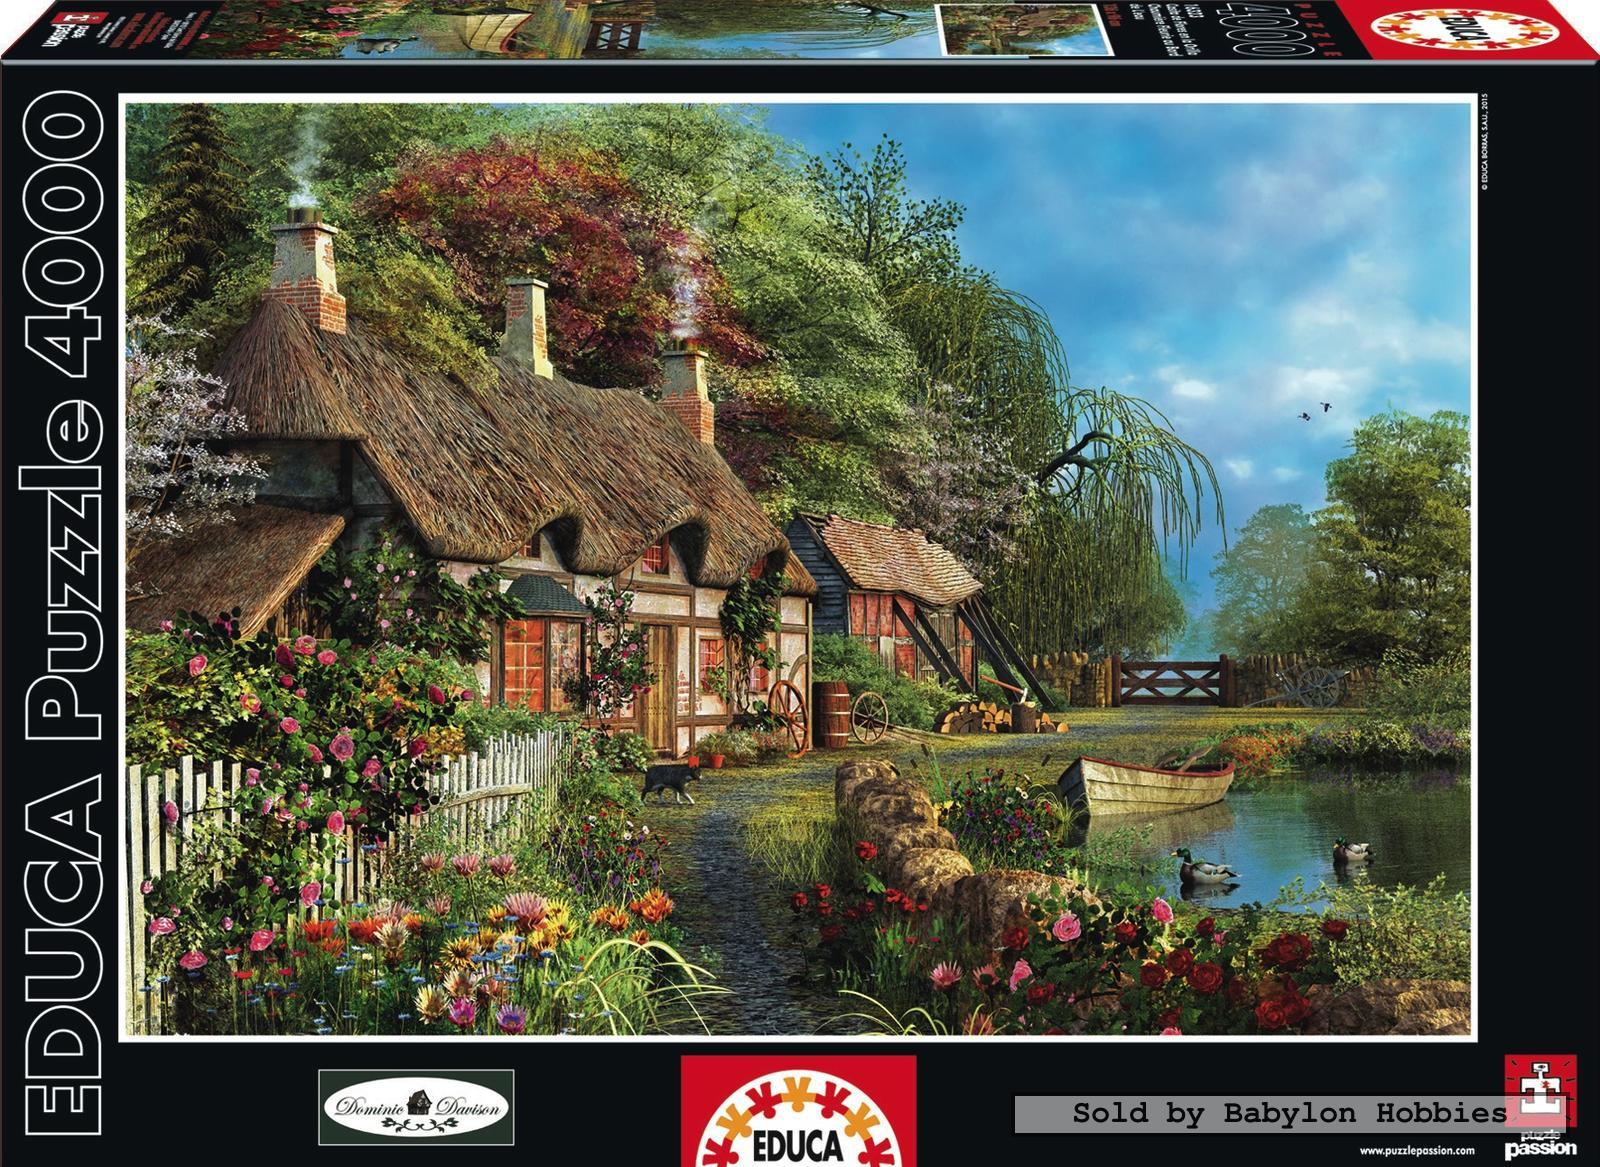 4000 pcs jigsaw puzzle riverside home in bloom art educa 16323 ebay. Black Bedroom Furniture Sets. Home Design Ideas